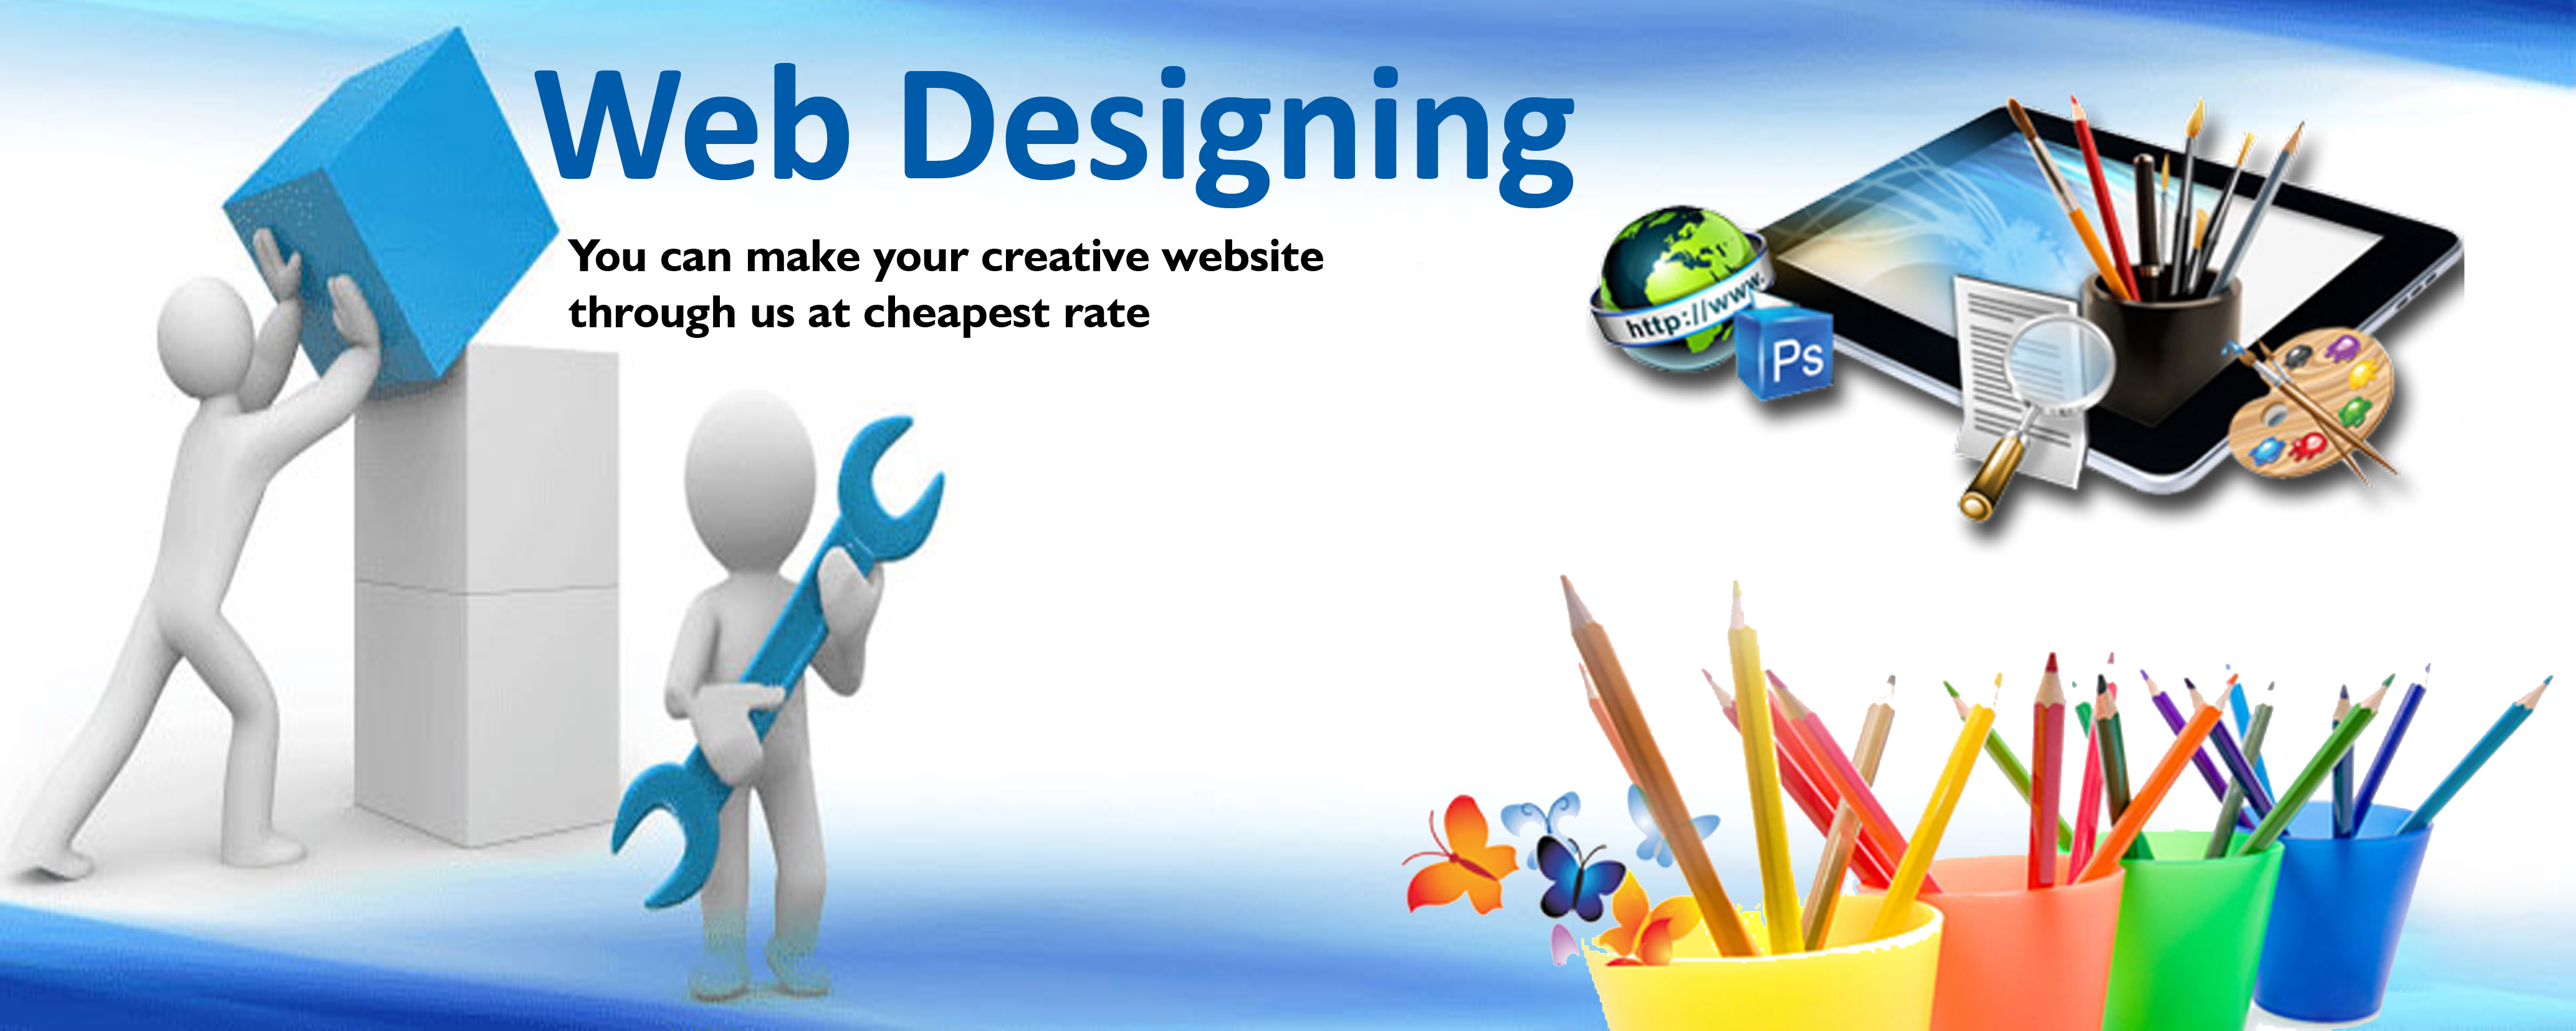 Web Design Company Chatham Township